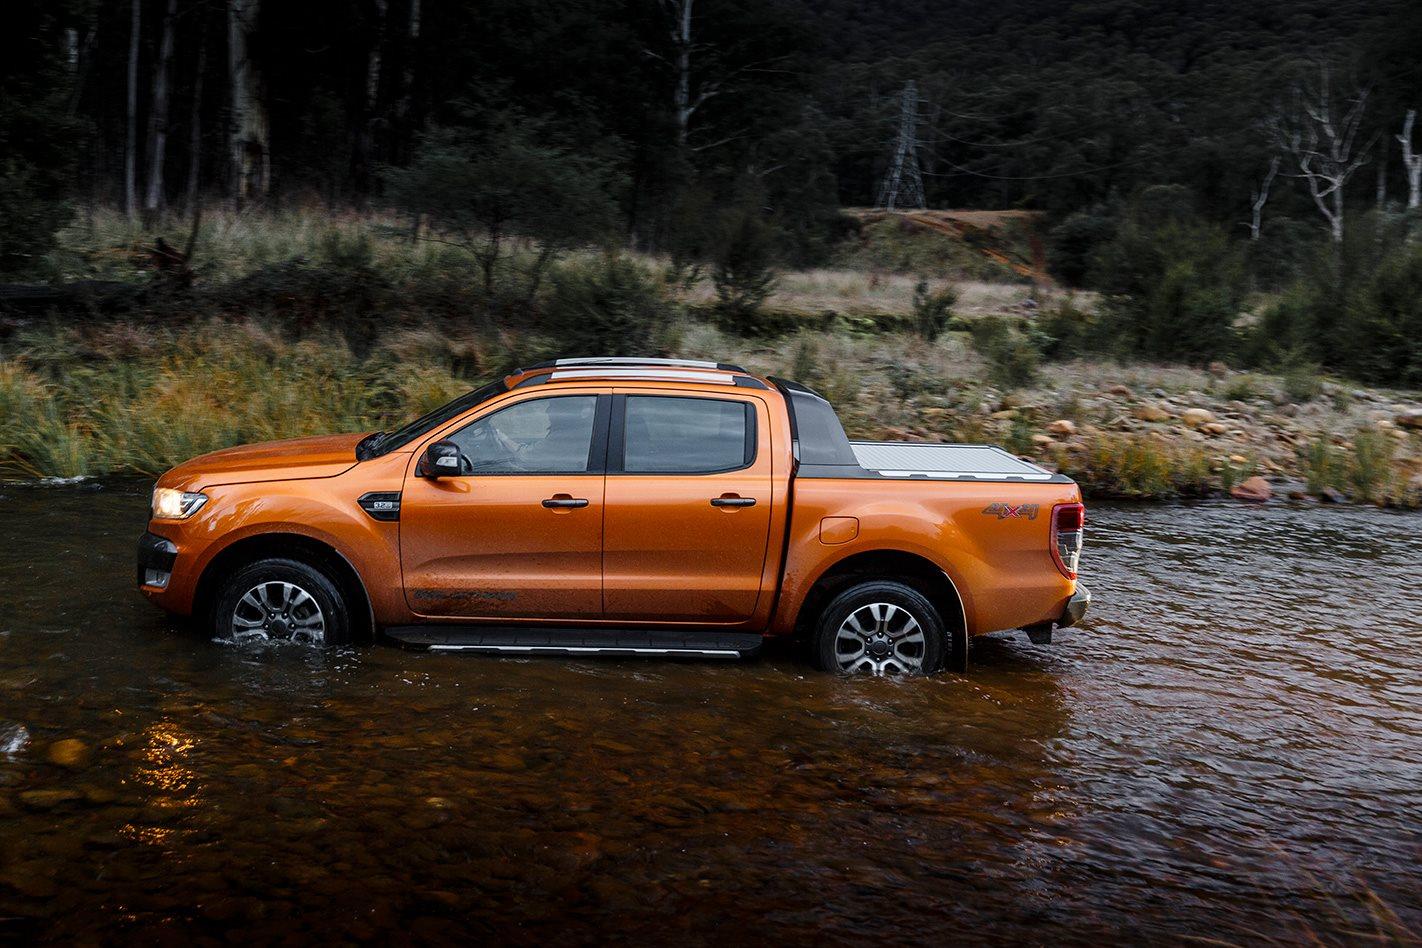 Ford Ranger Wildtrak in water.jpg